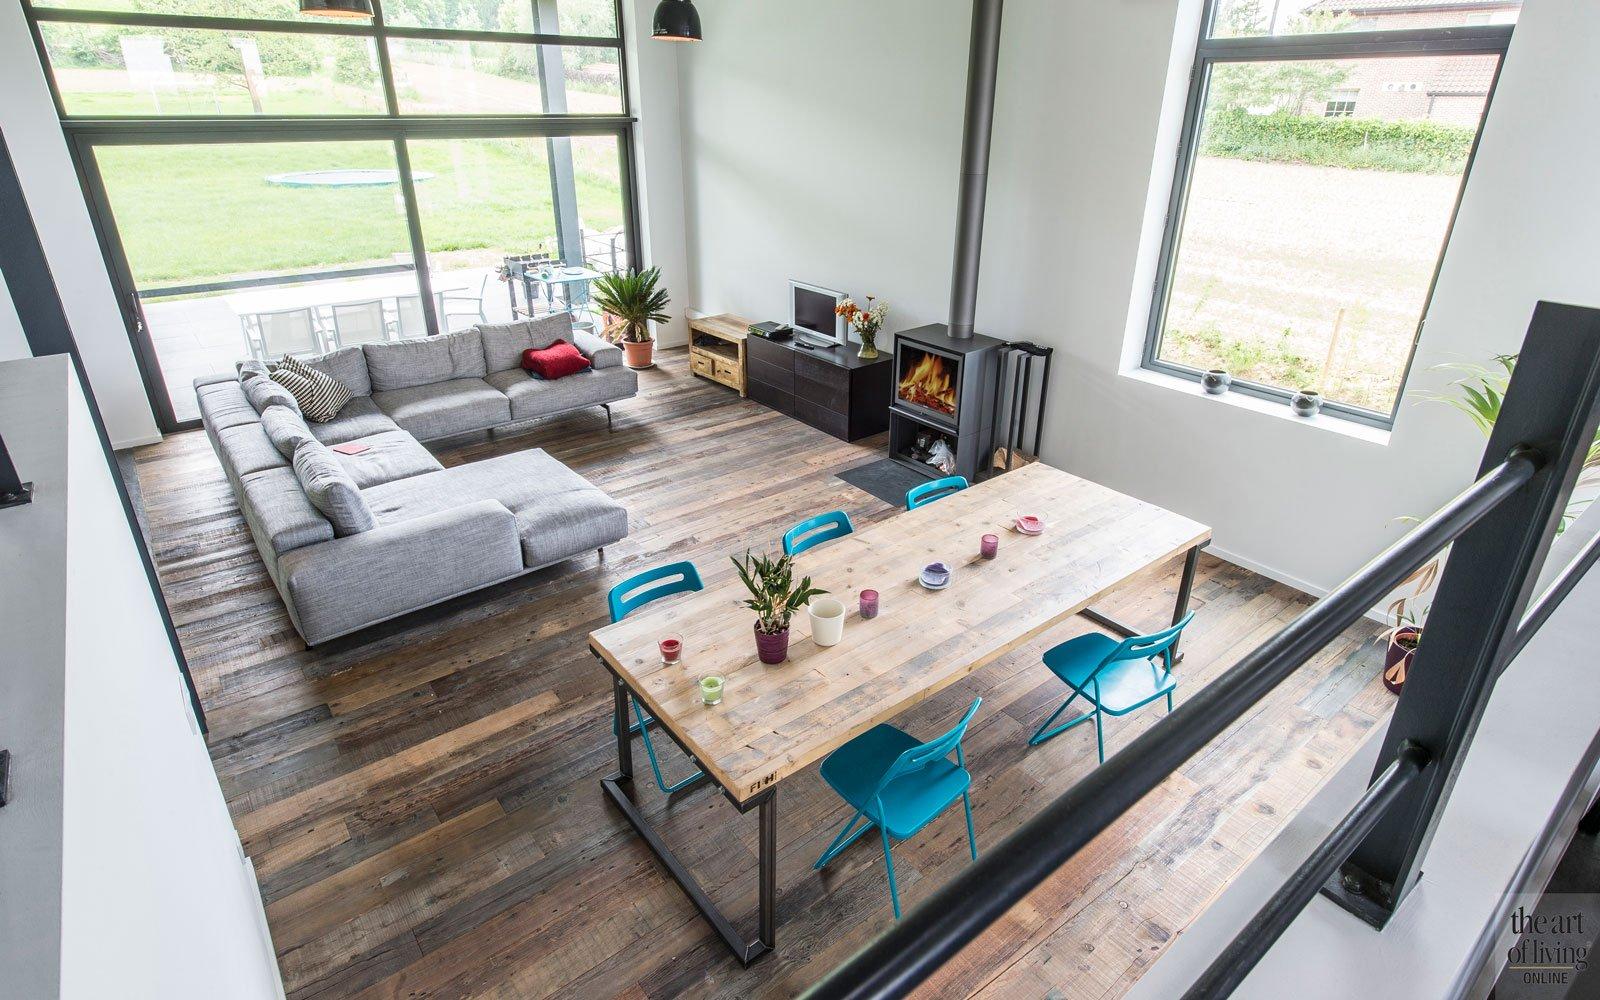 Architect Kleine Woning : Industriële woning bvv architecten the art of living be